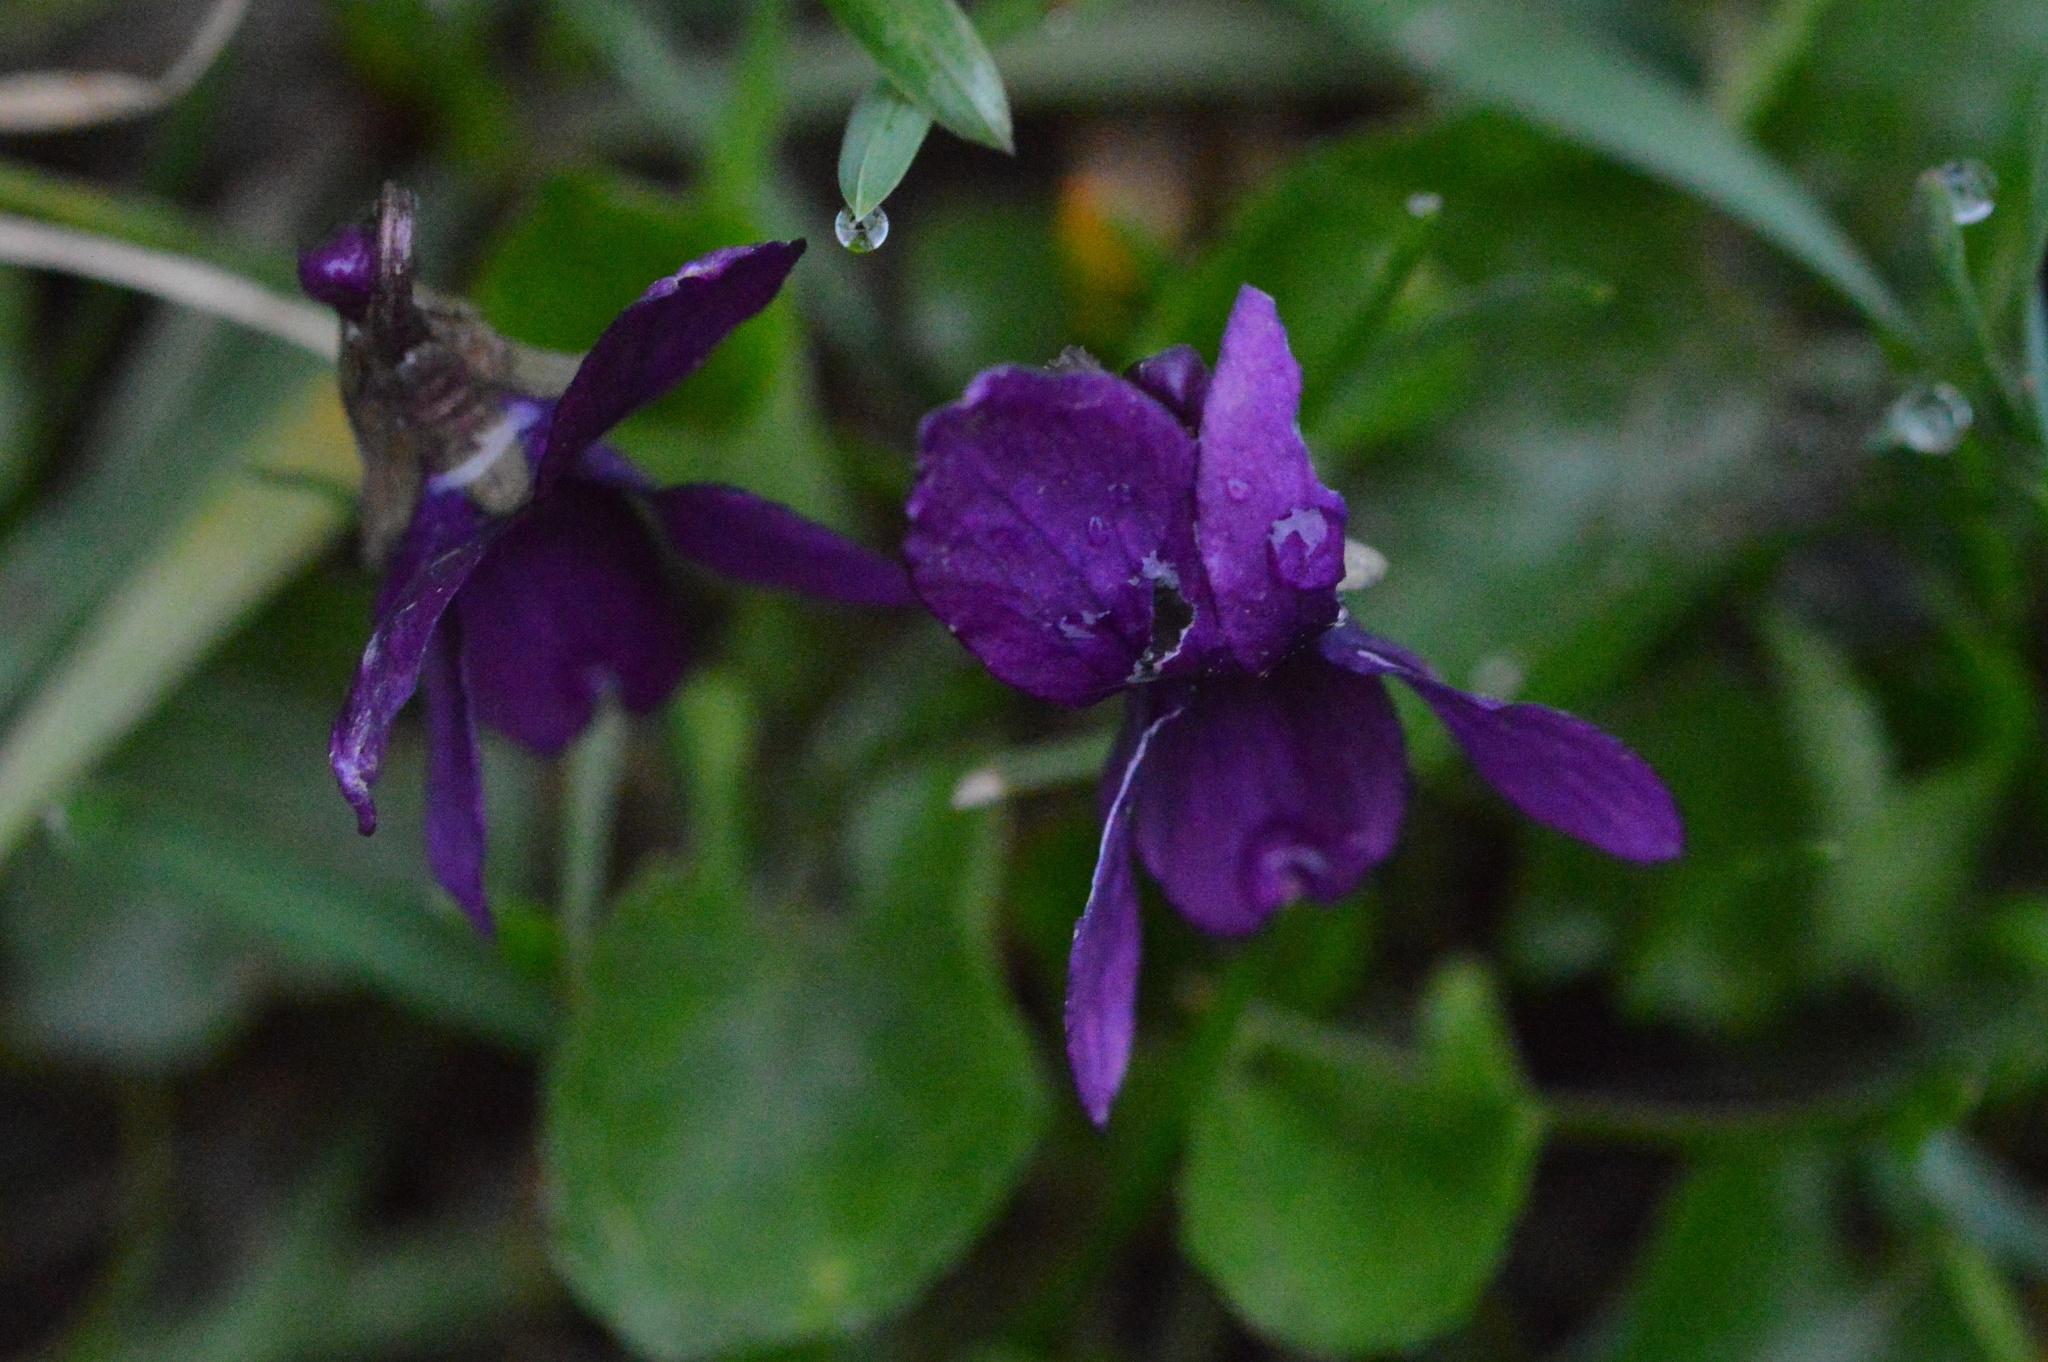 violette by lorena.rinaudo.9